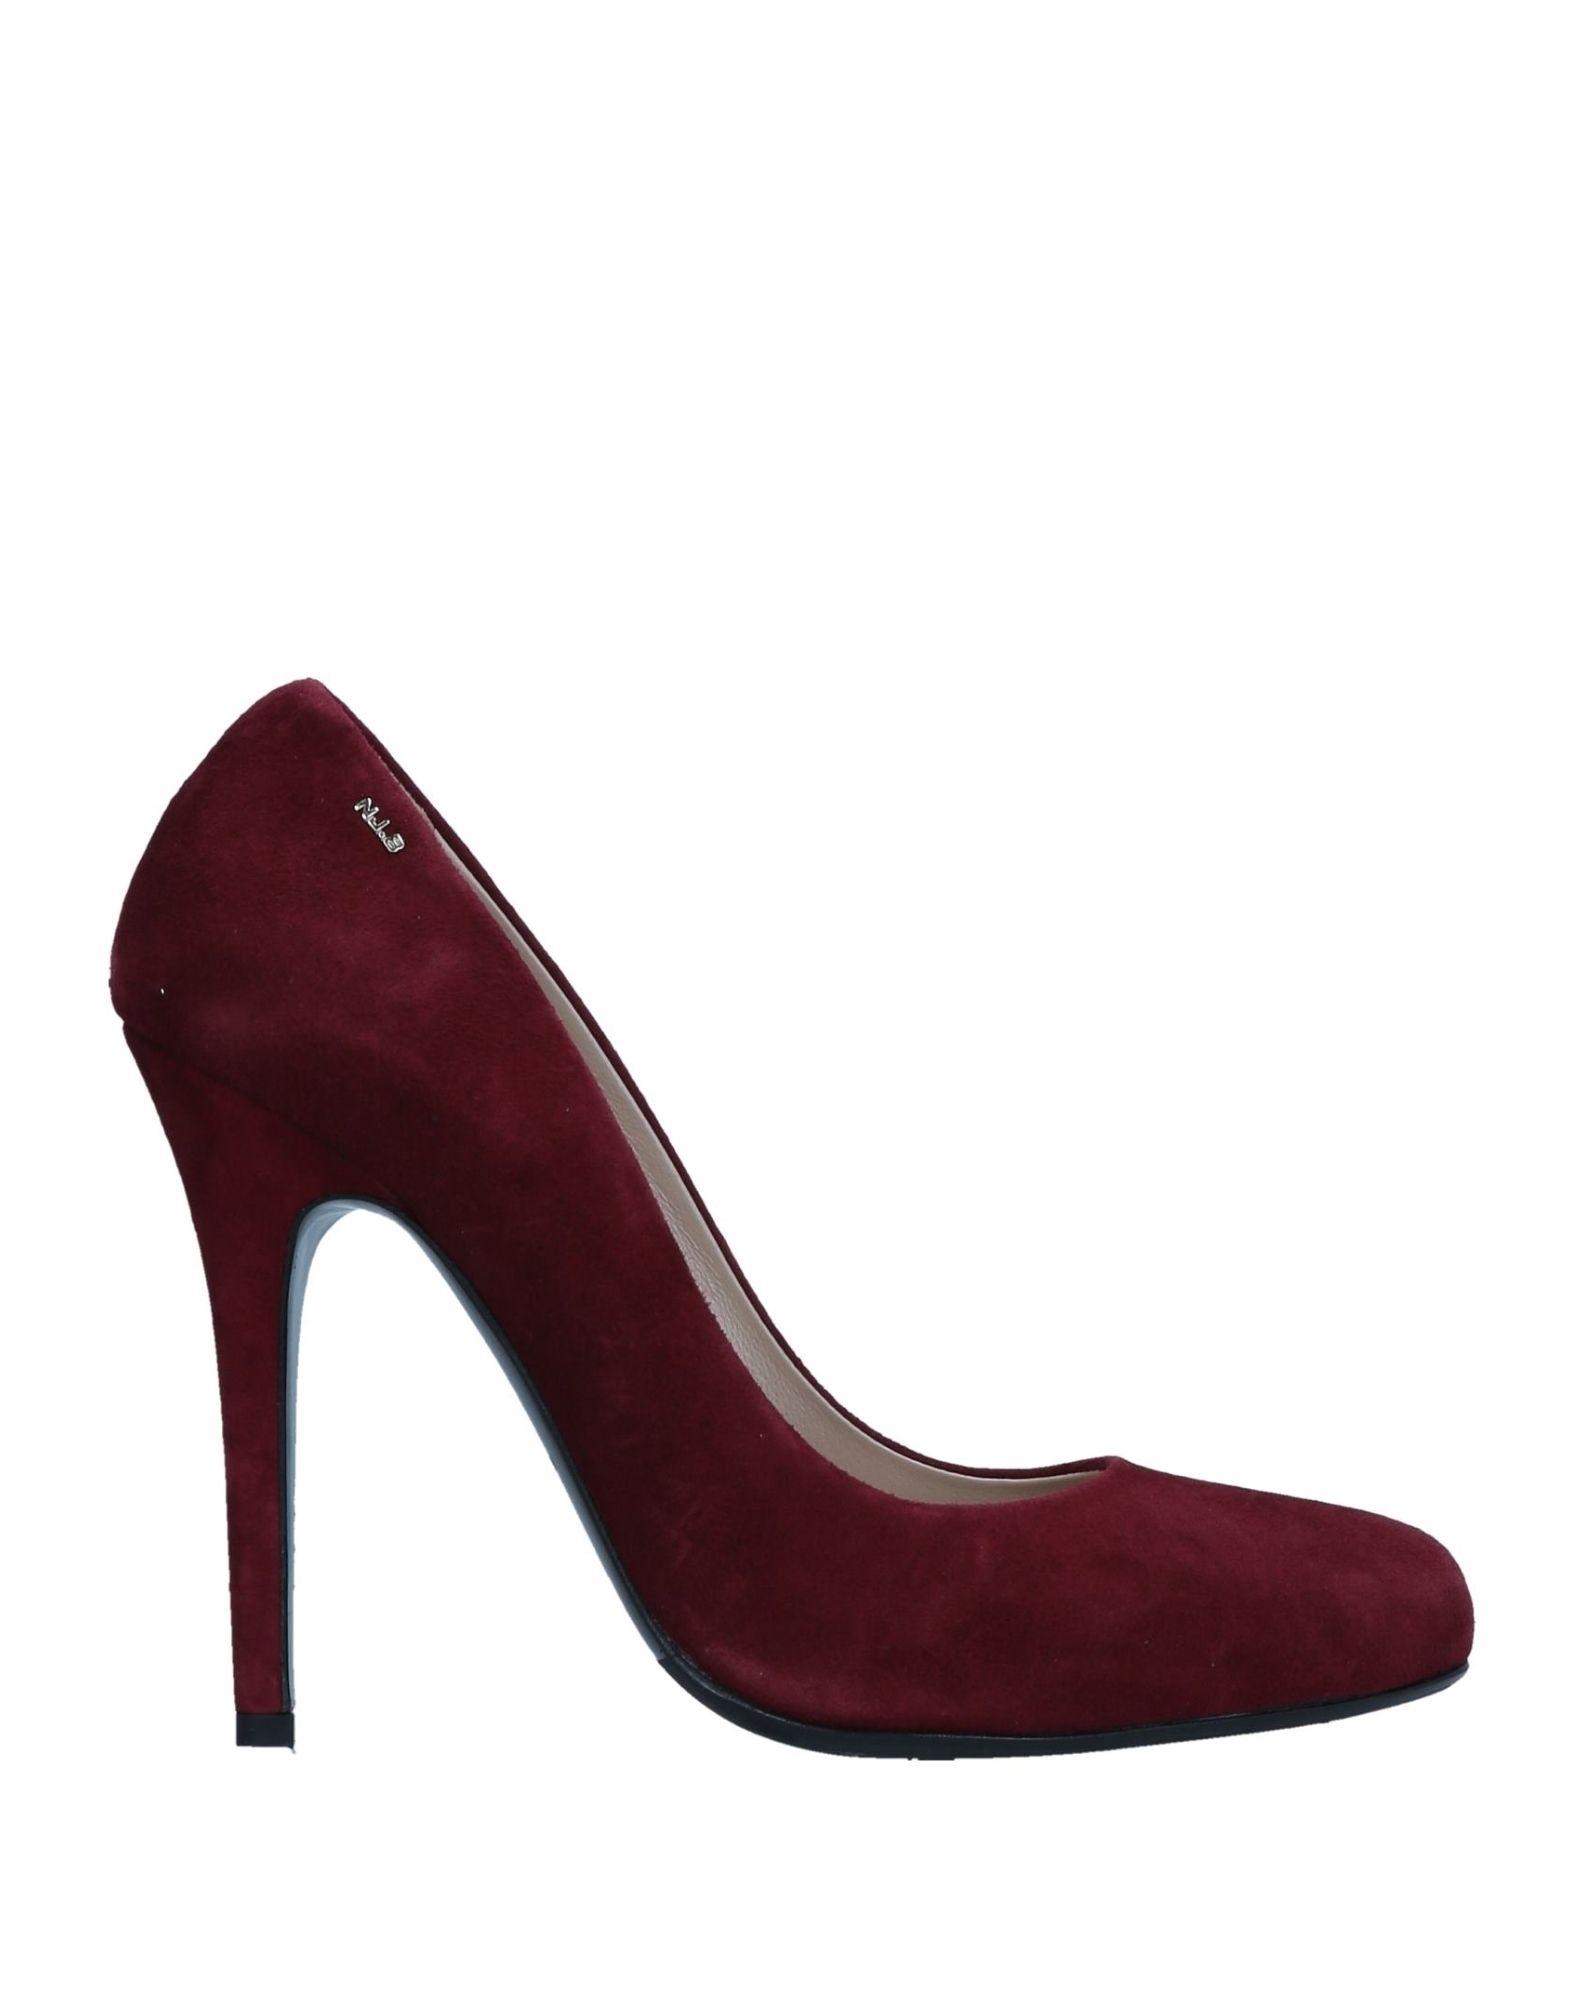 Norma J.Baker Pumps Damen  11547270IUGut aussehende strapazierfähige Schuhe